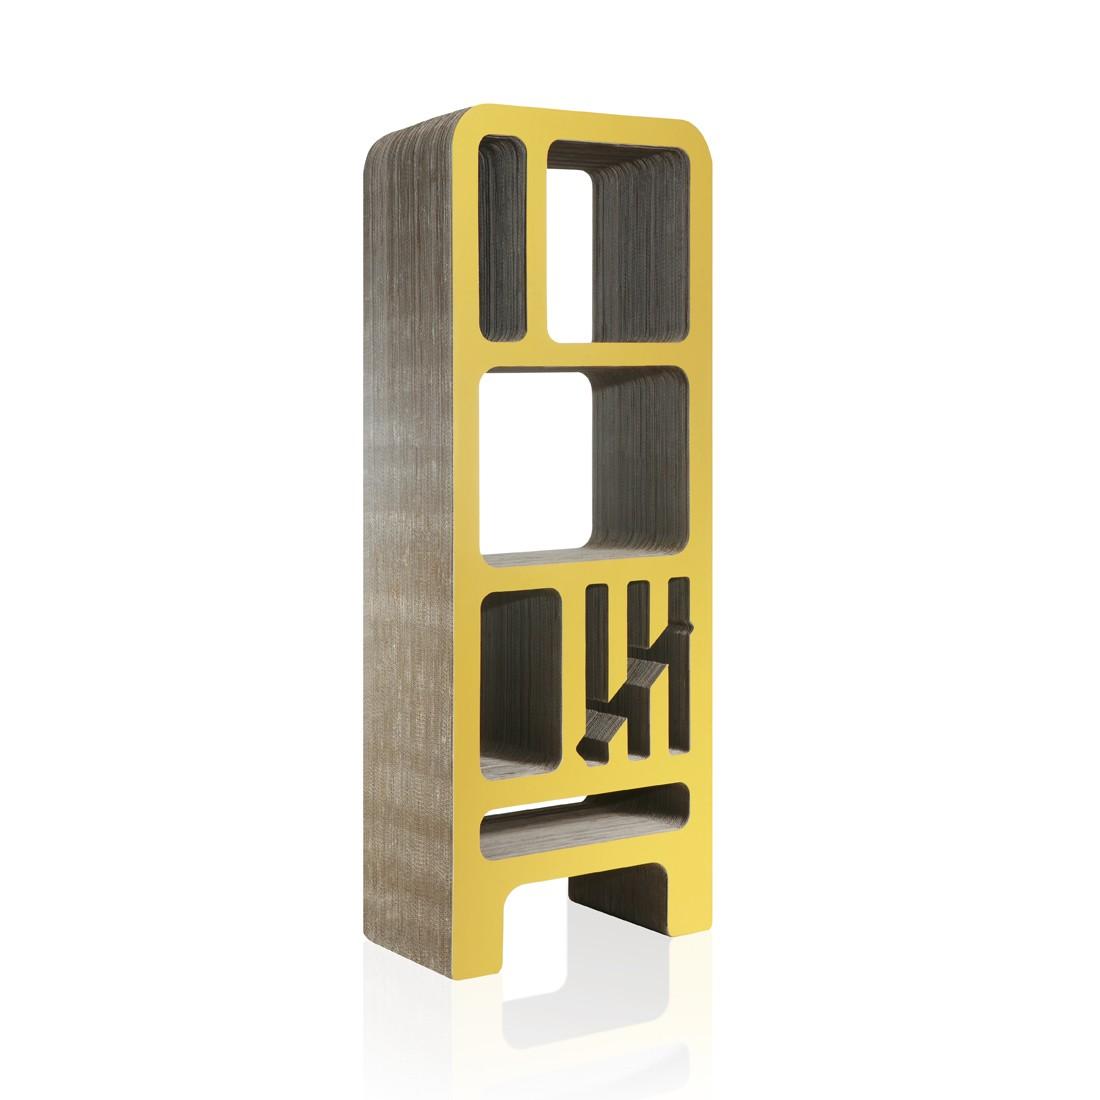 Modern Cardboard Furniture for your Eco Friendly Room Design